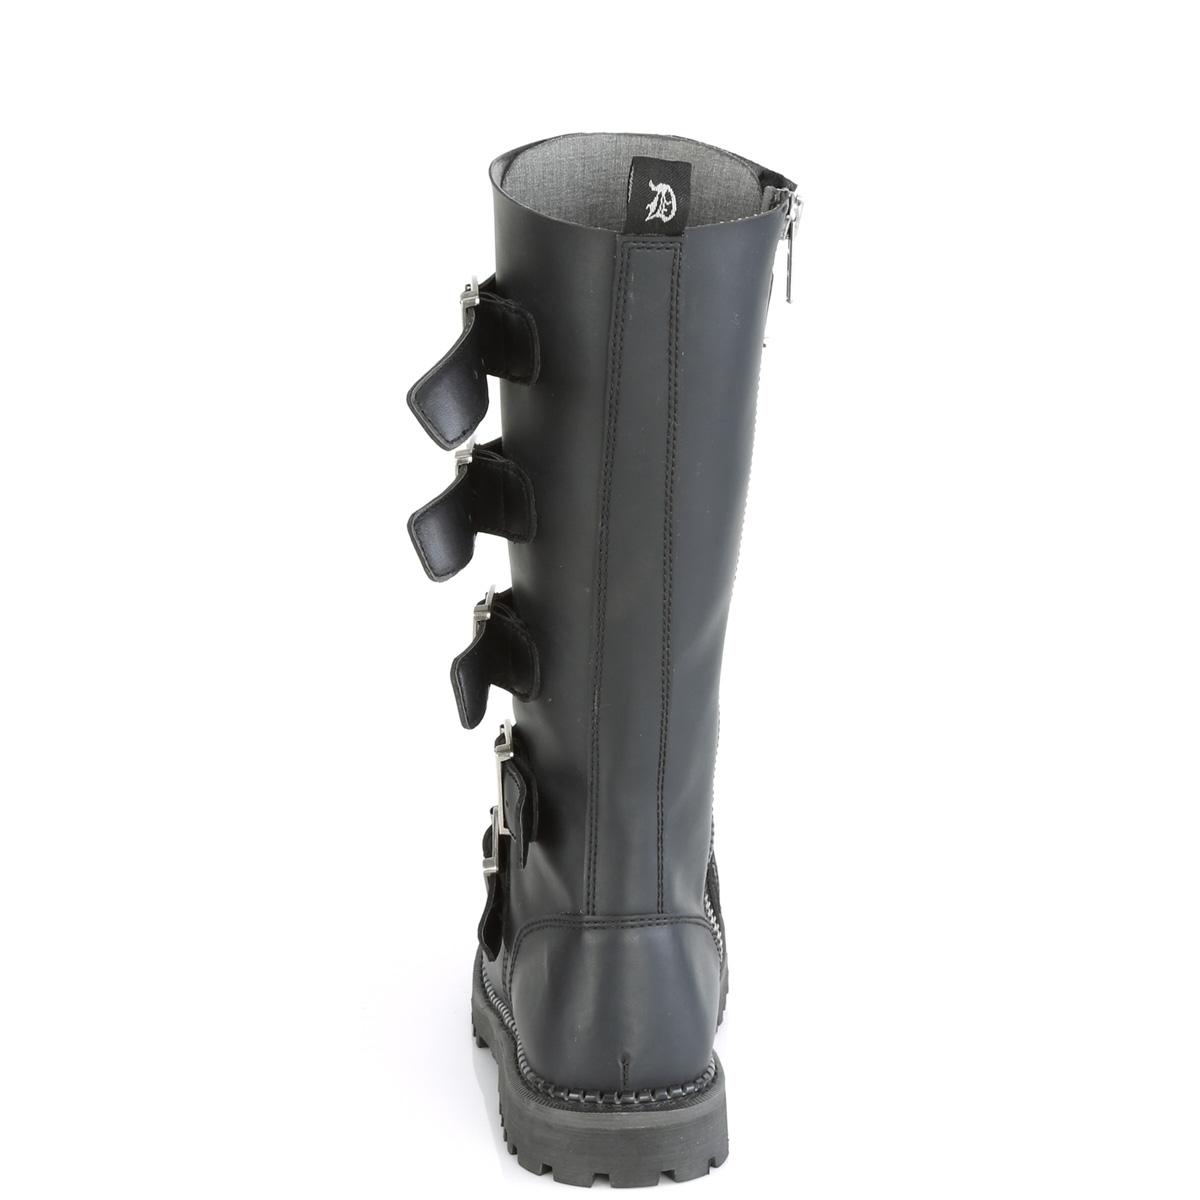 Demonia(デモニア) RIOT-18BK スティールトゥ 編み上げ&バックルストラップブーツ ヴィーガンレザー(合皮) #Men's/Unisex◆取り寄せ